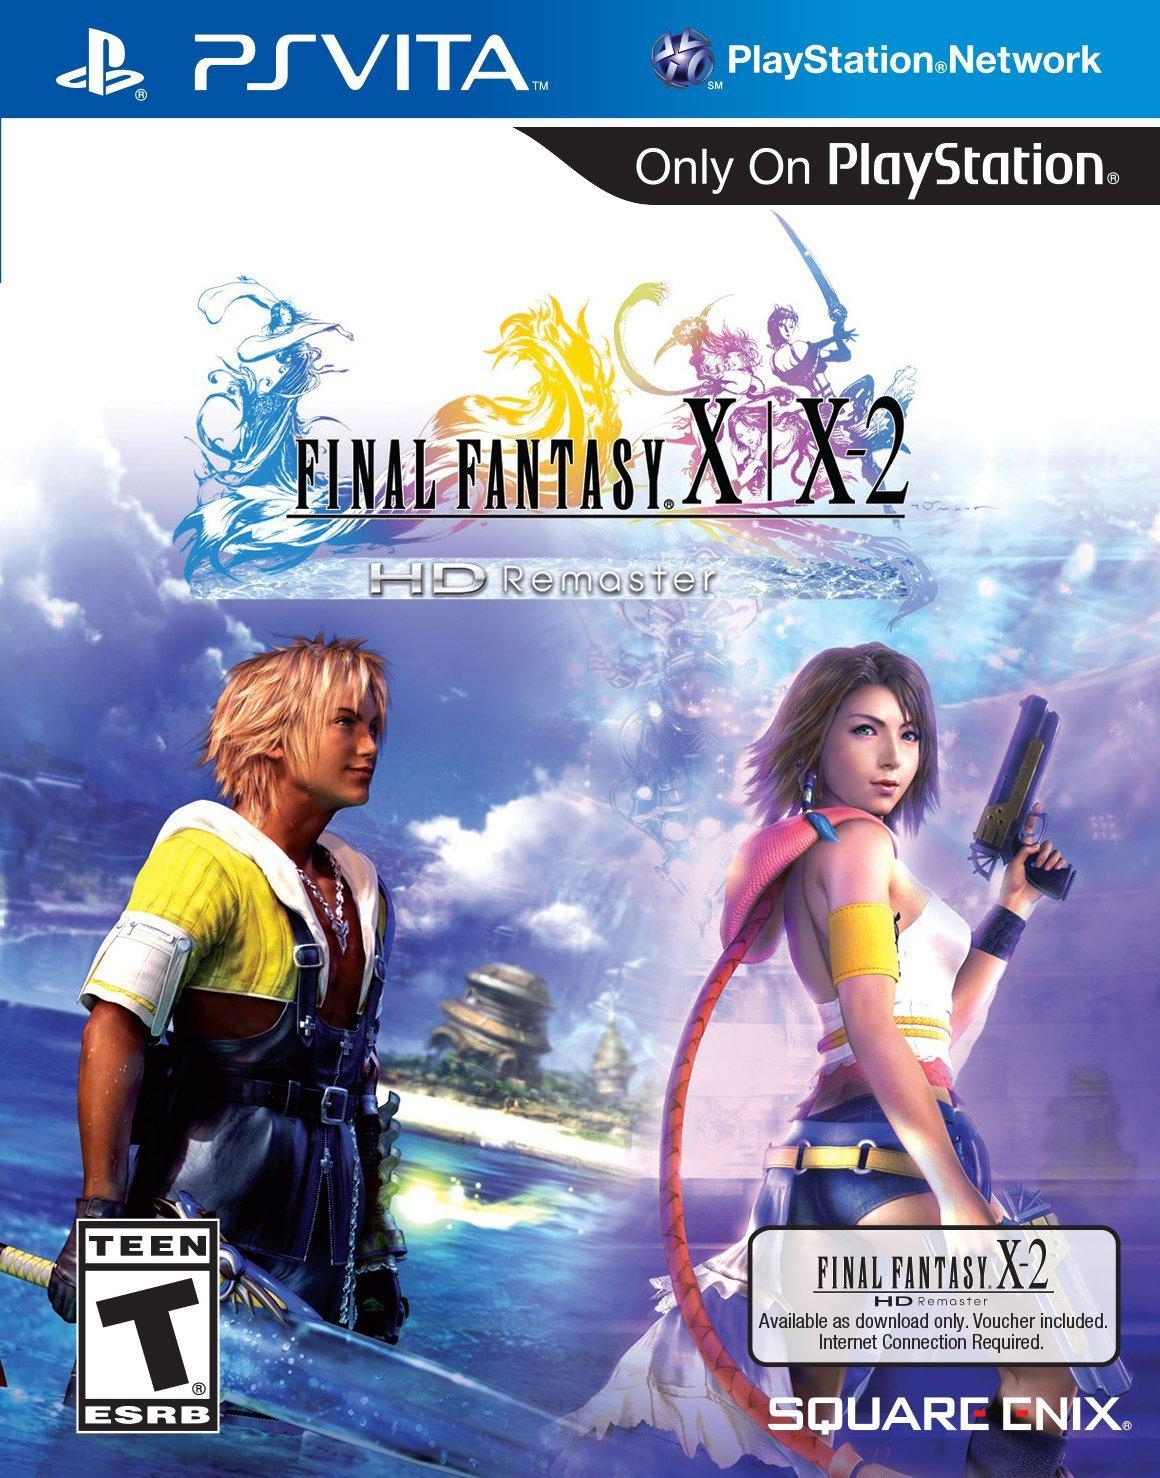 Final Fantasy X & X2